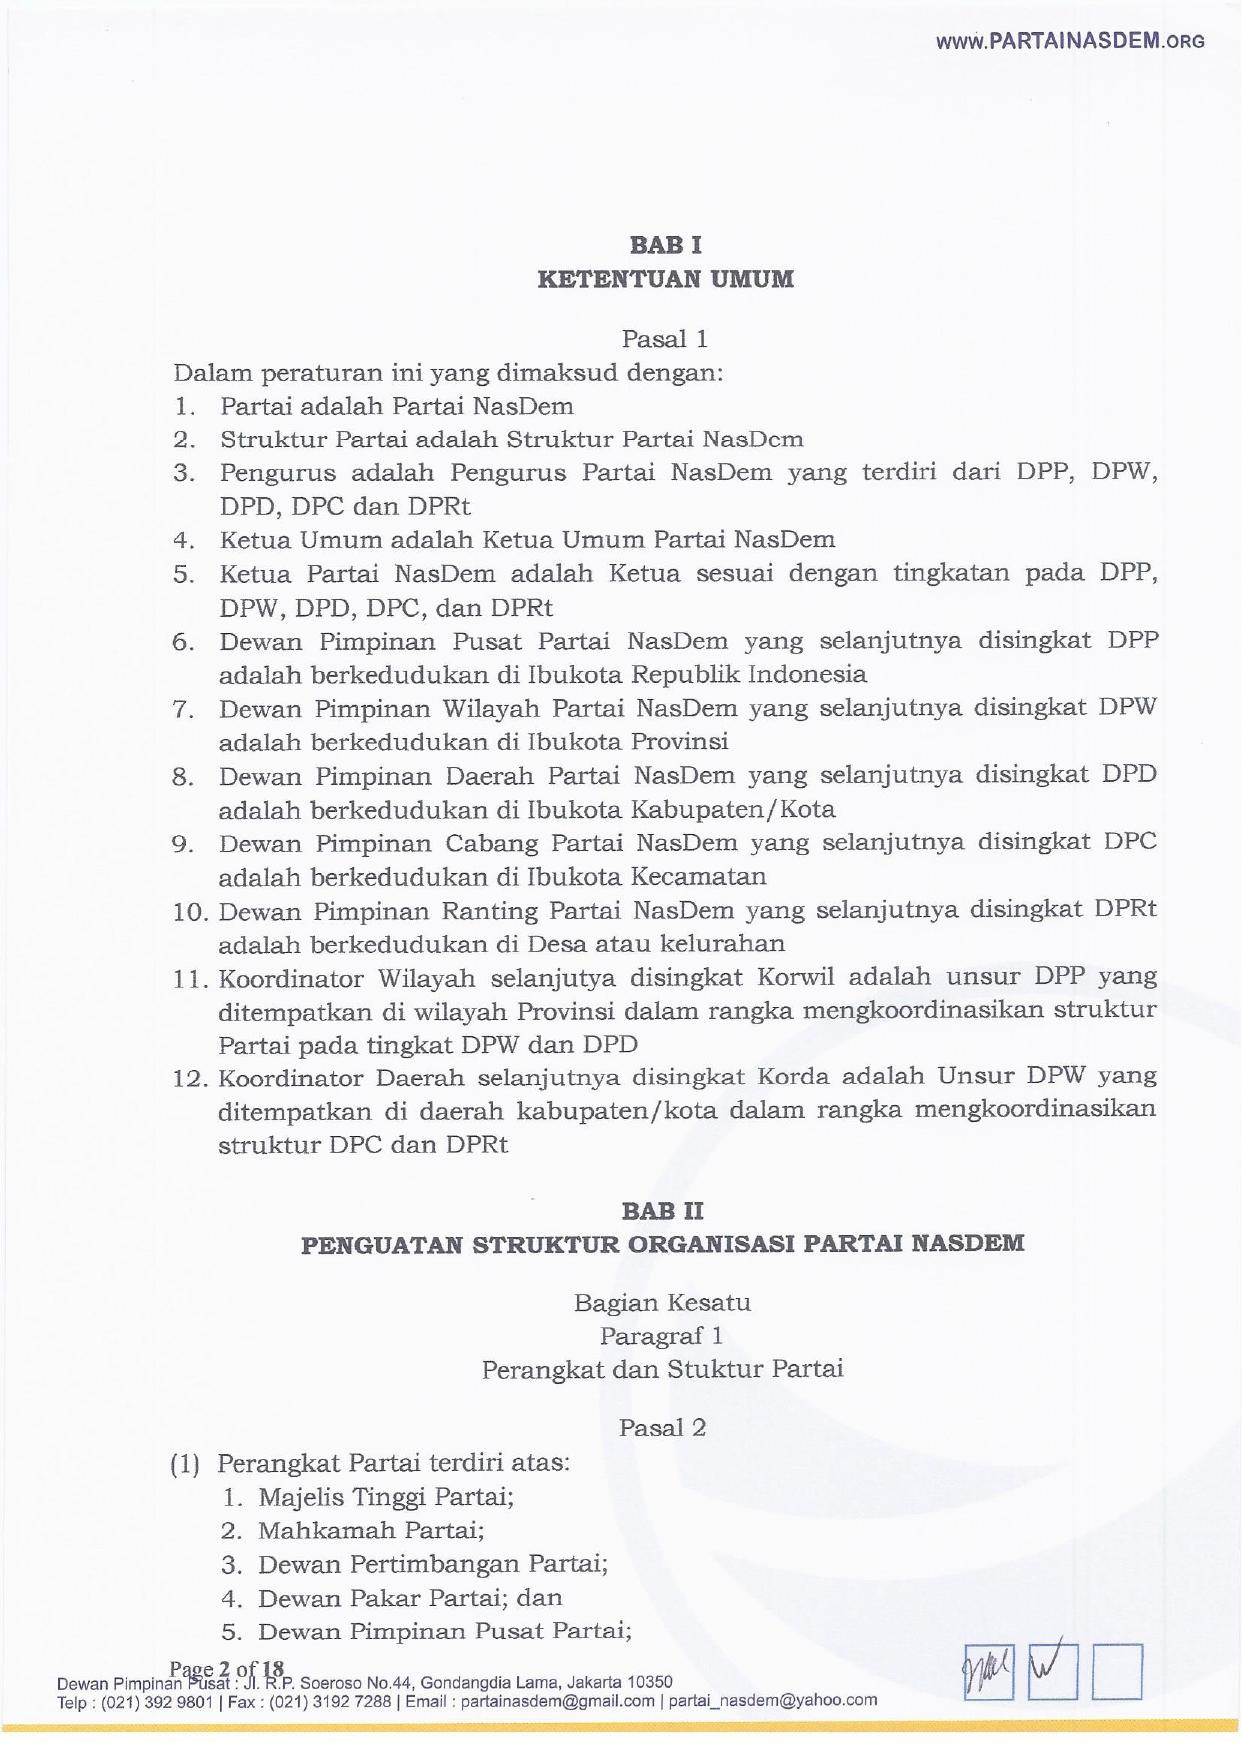 2016_PO no 01 PENGUATAN STRUKTUR DAN PERSIAPAN VERIFIKASI_page-0002